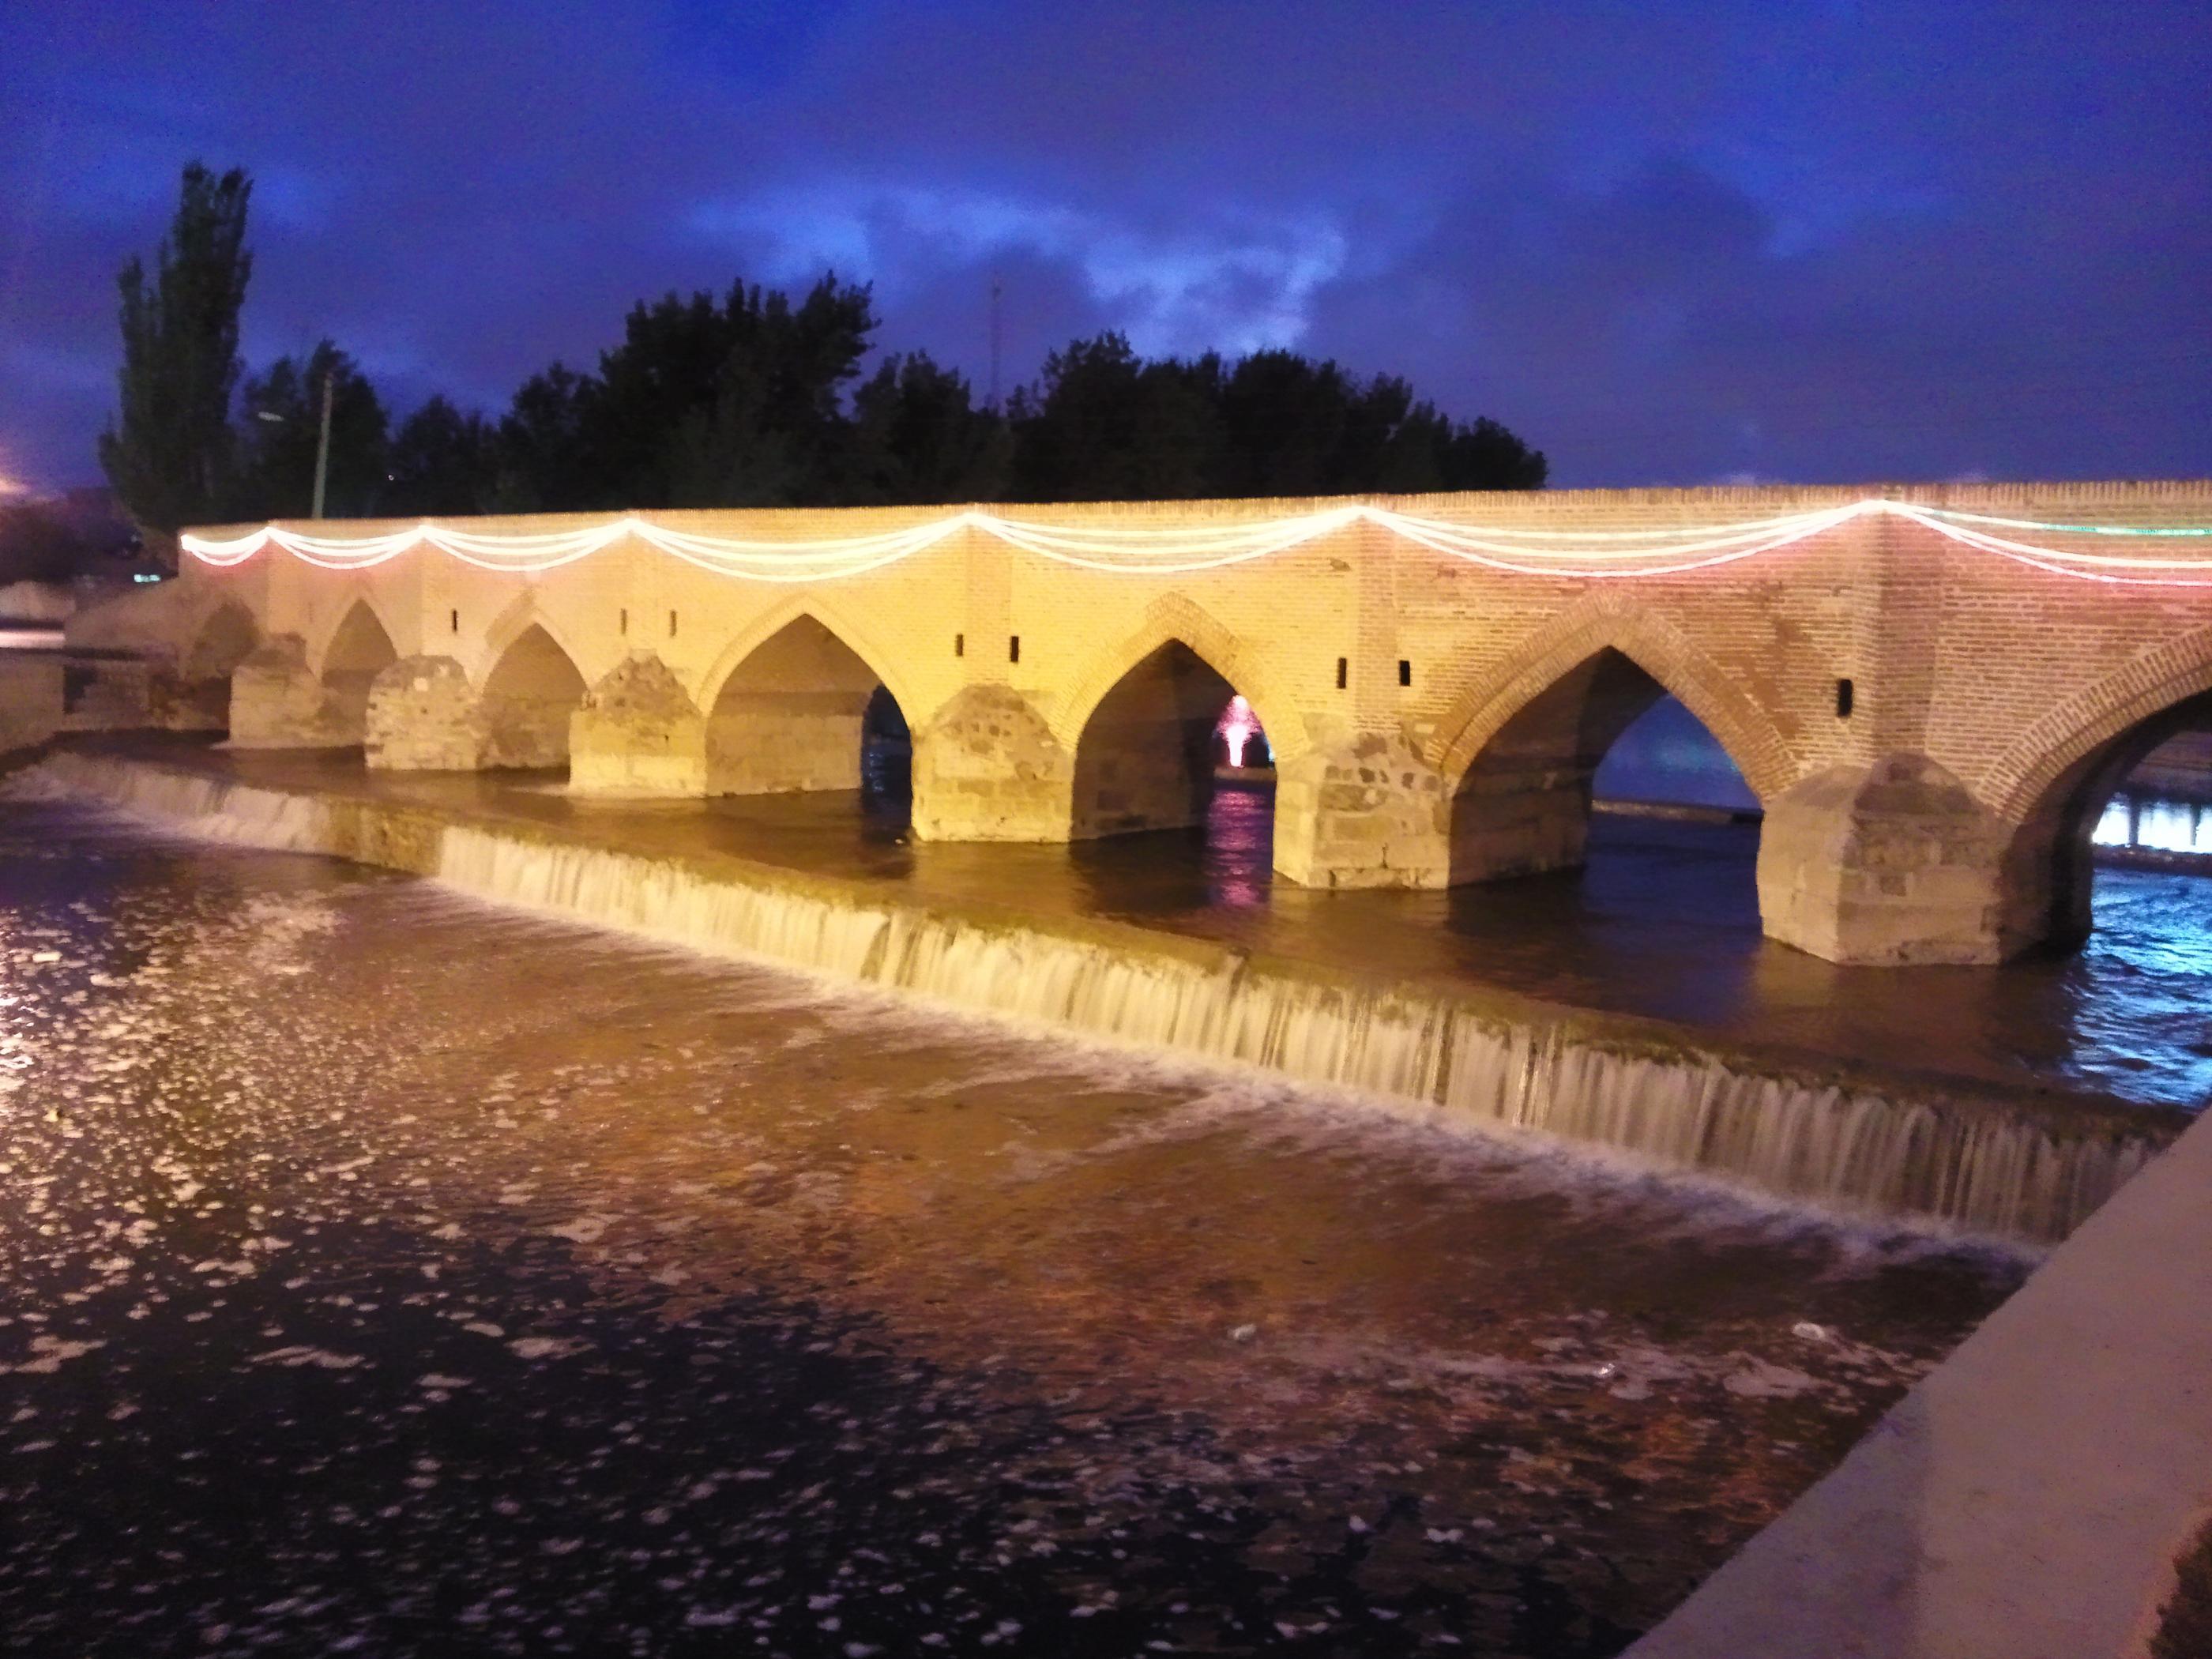 balighli - پل هفت چشمه اردبیل | Ardabil